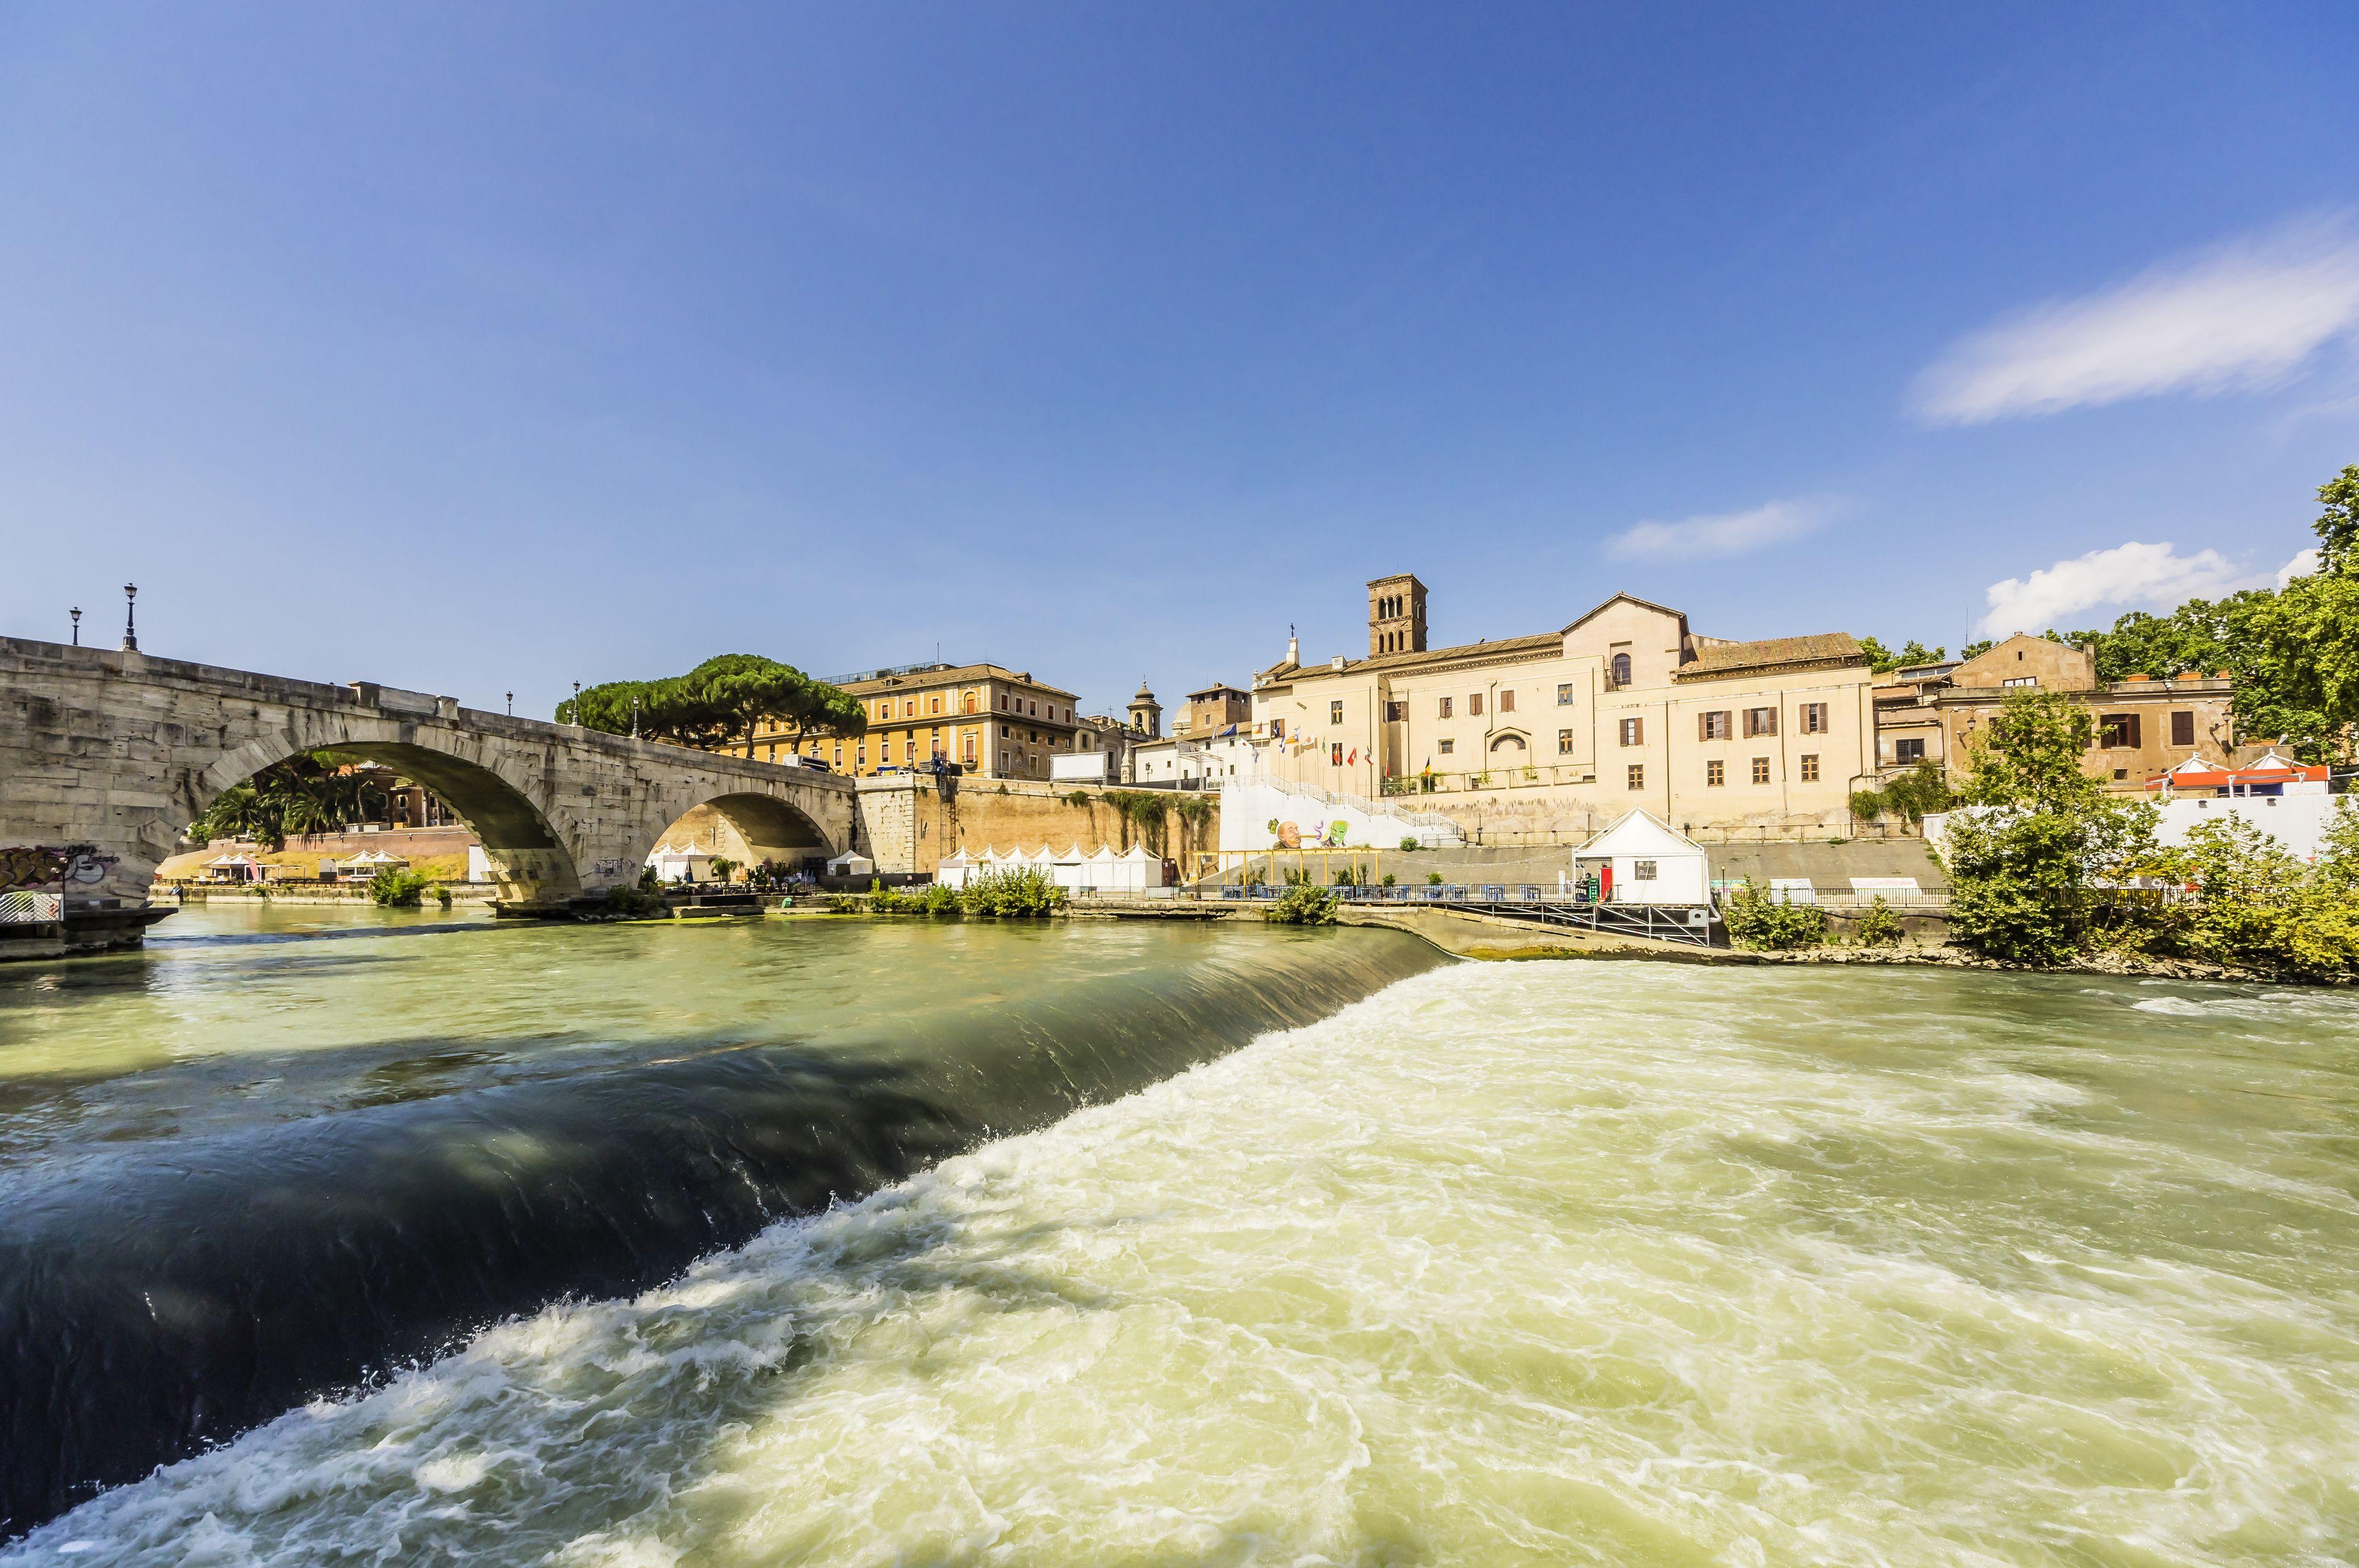 Italy, Rome, view to Ponte Cestio over Tiber river and Tiber Island